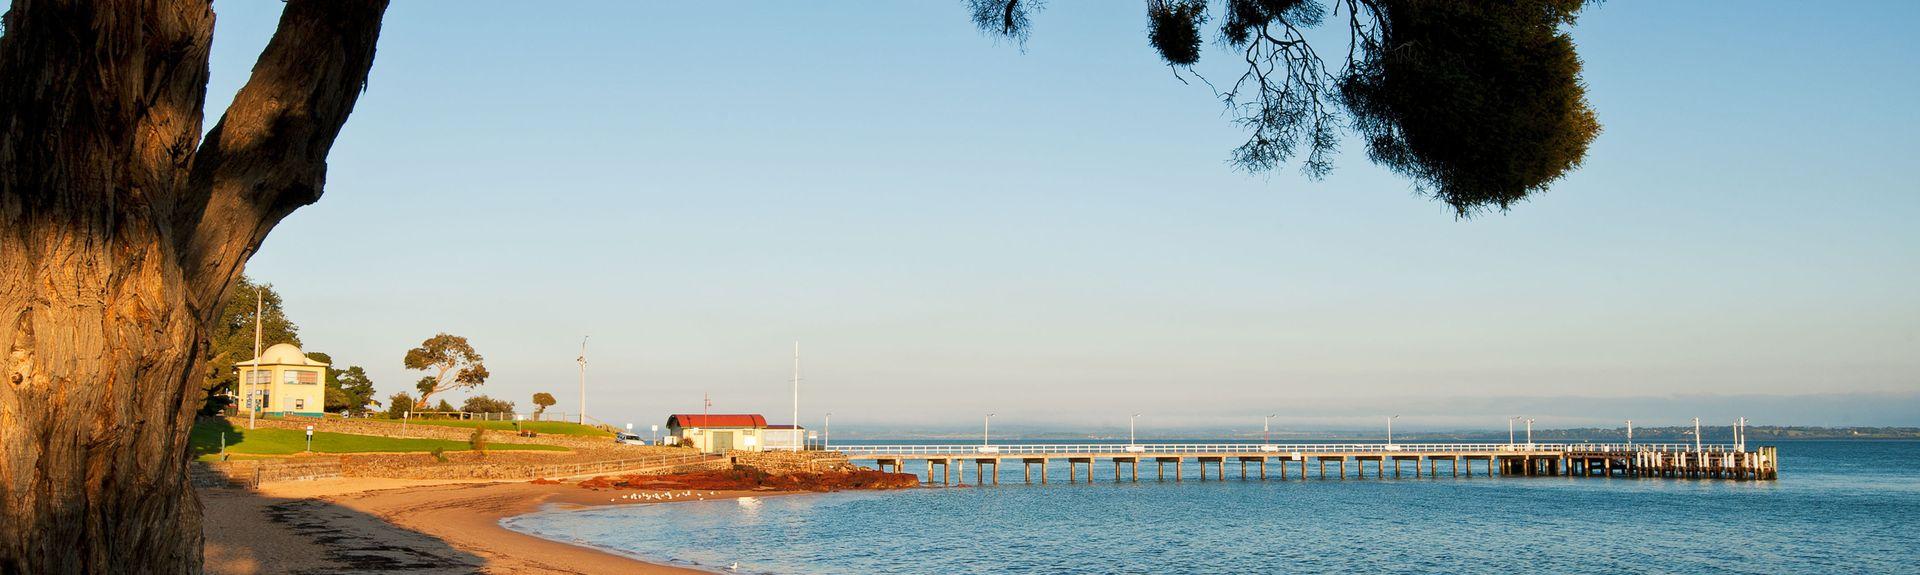 Cowes, VIC, Australia